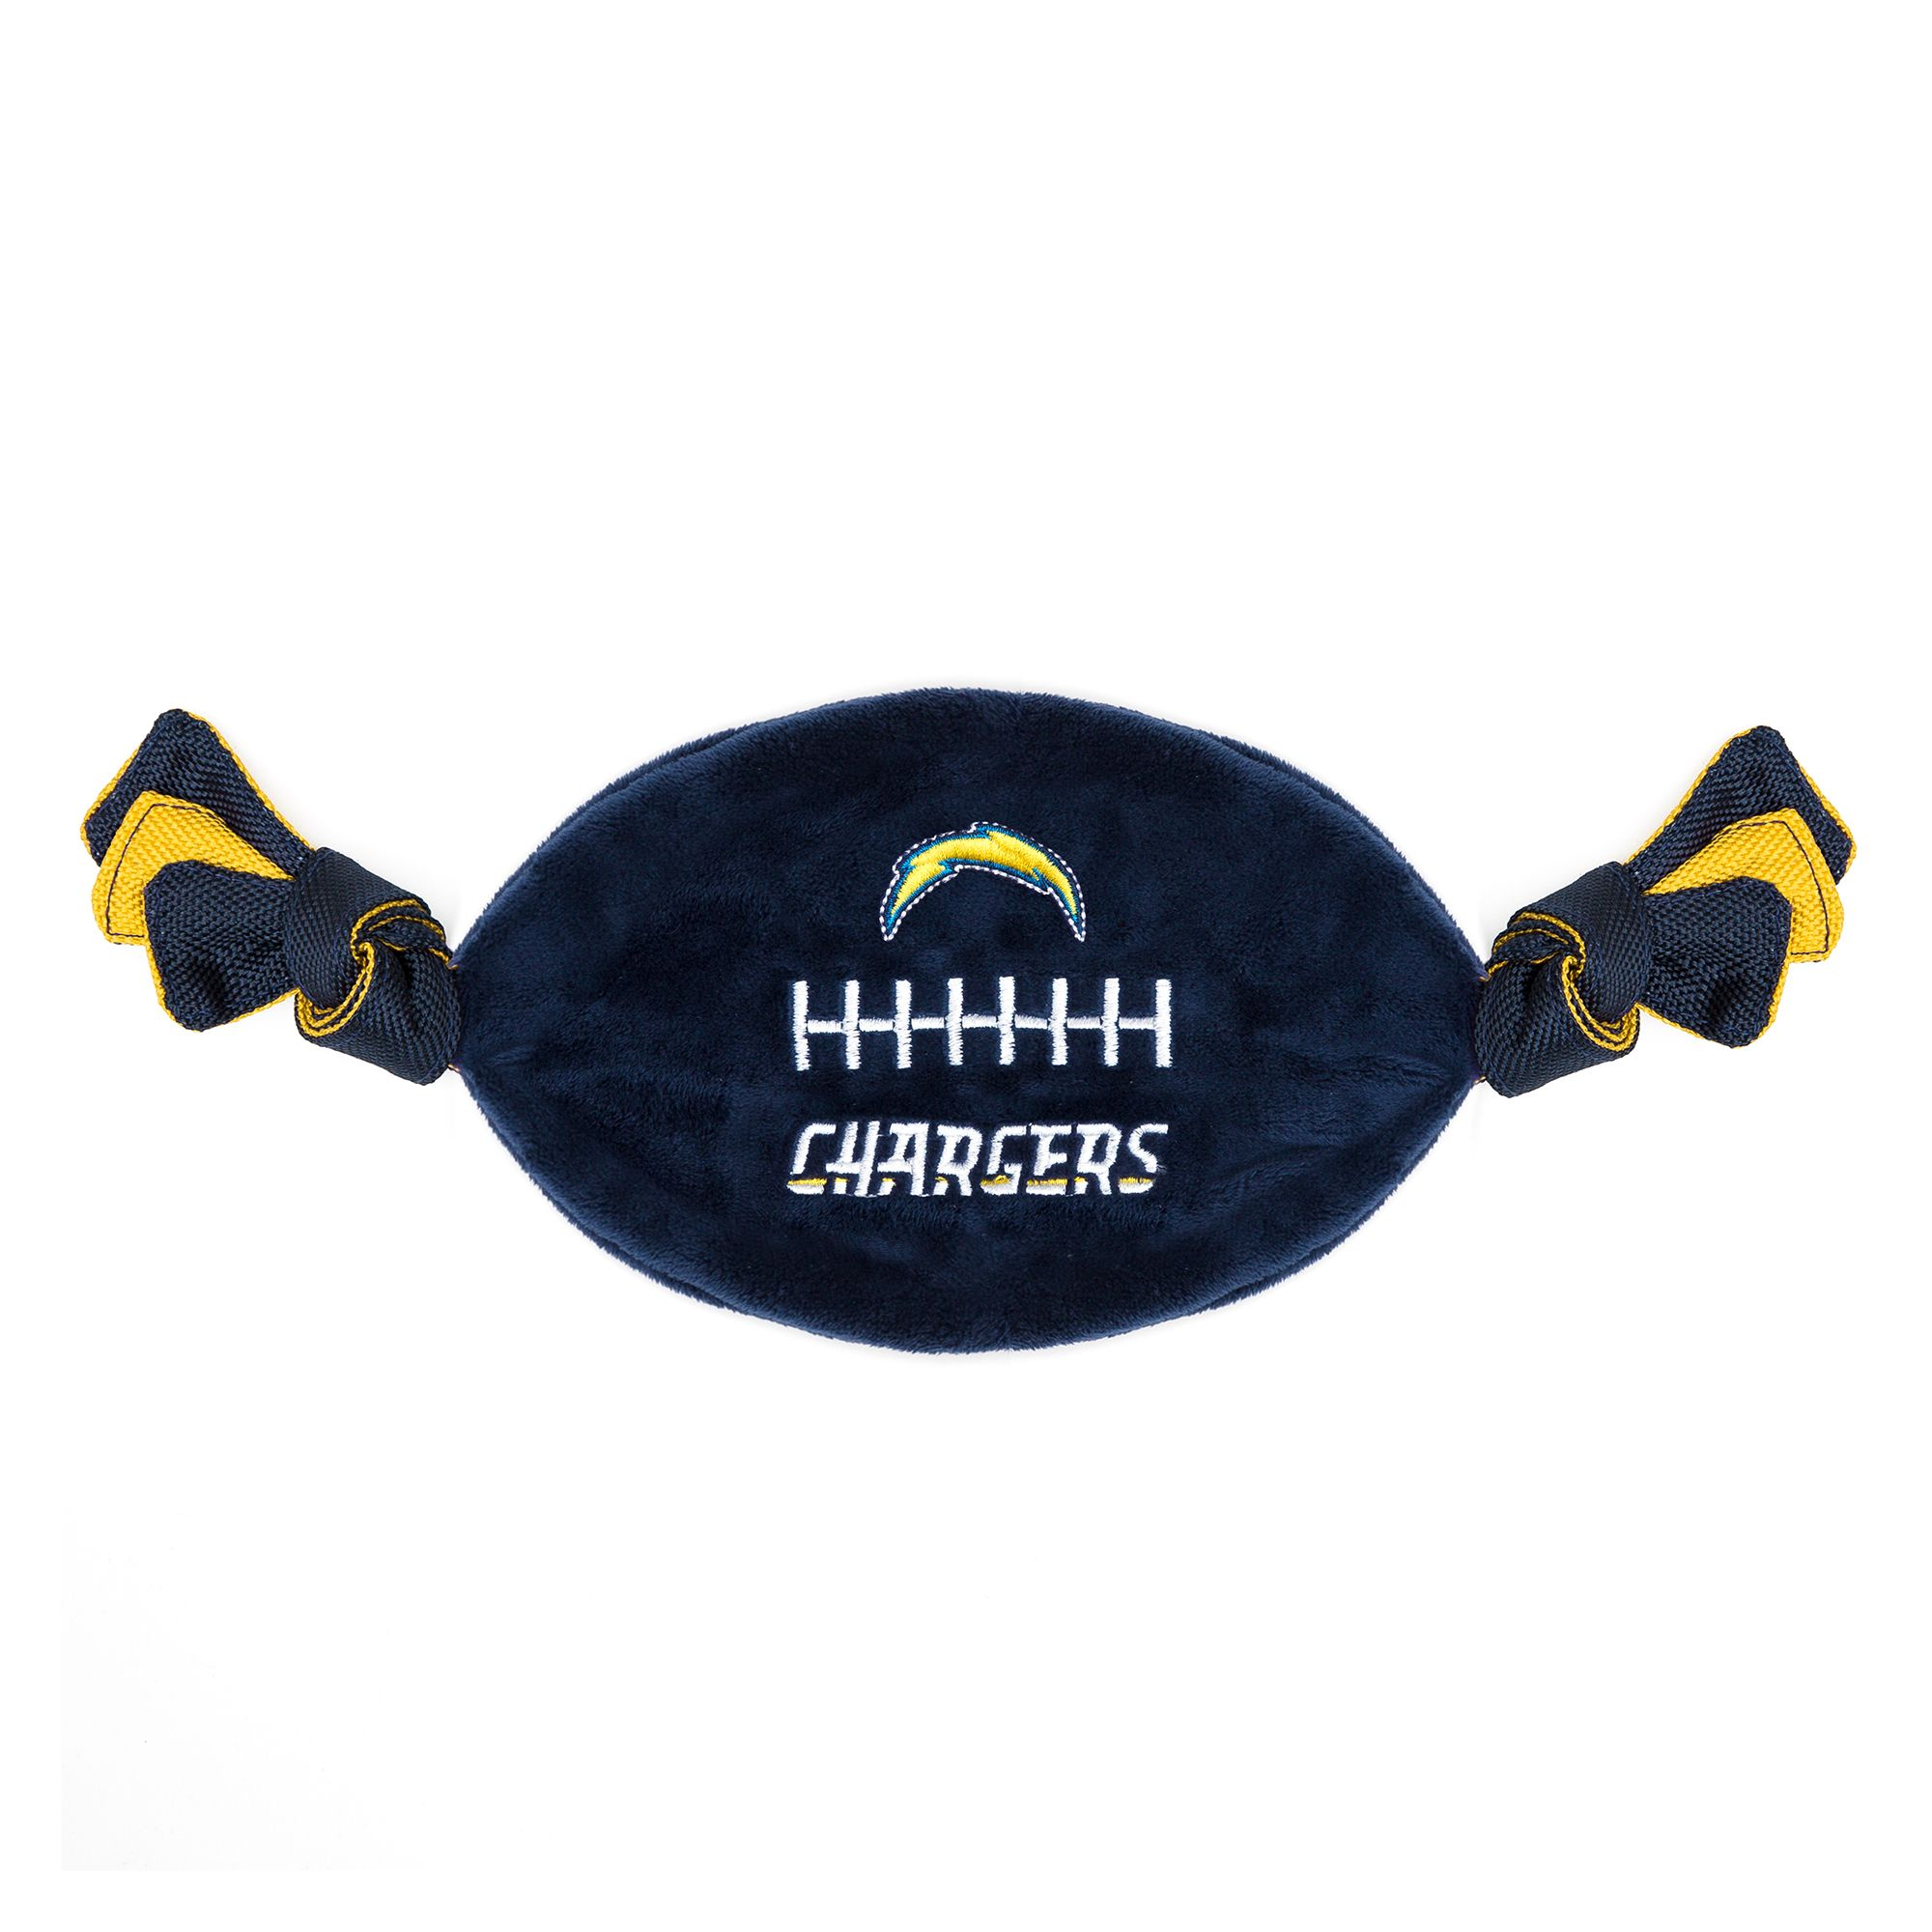 San Diego Chargers NFL Flattie Crinkle Football Toy 5259768